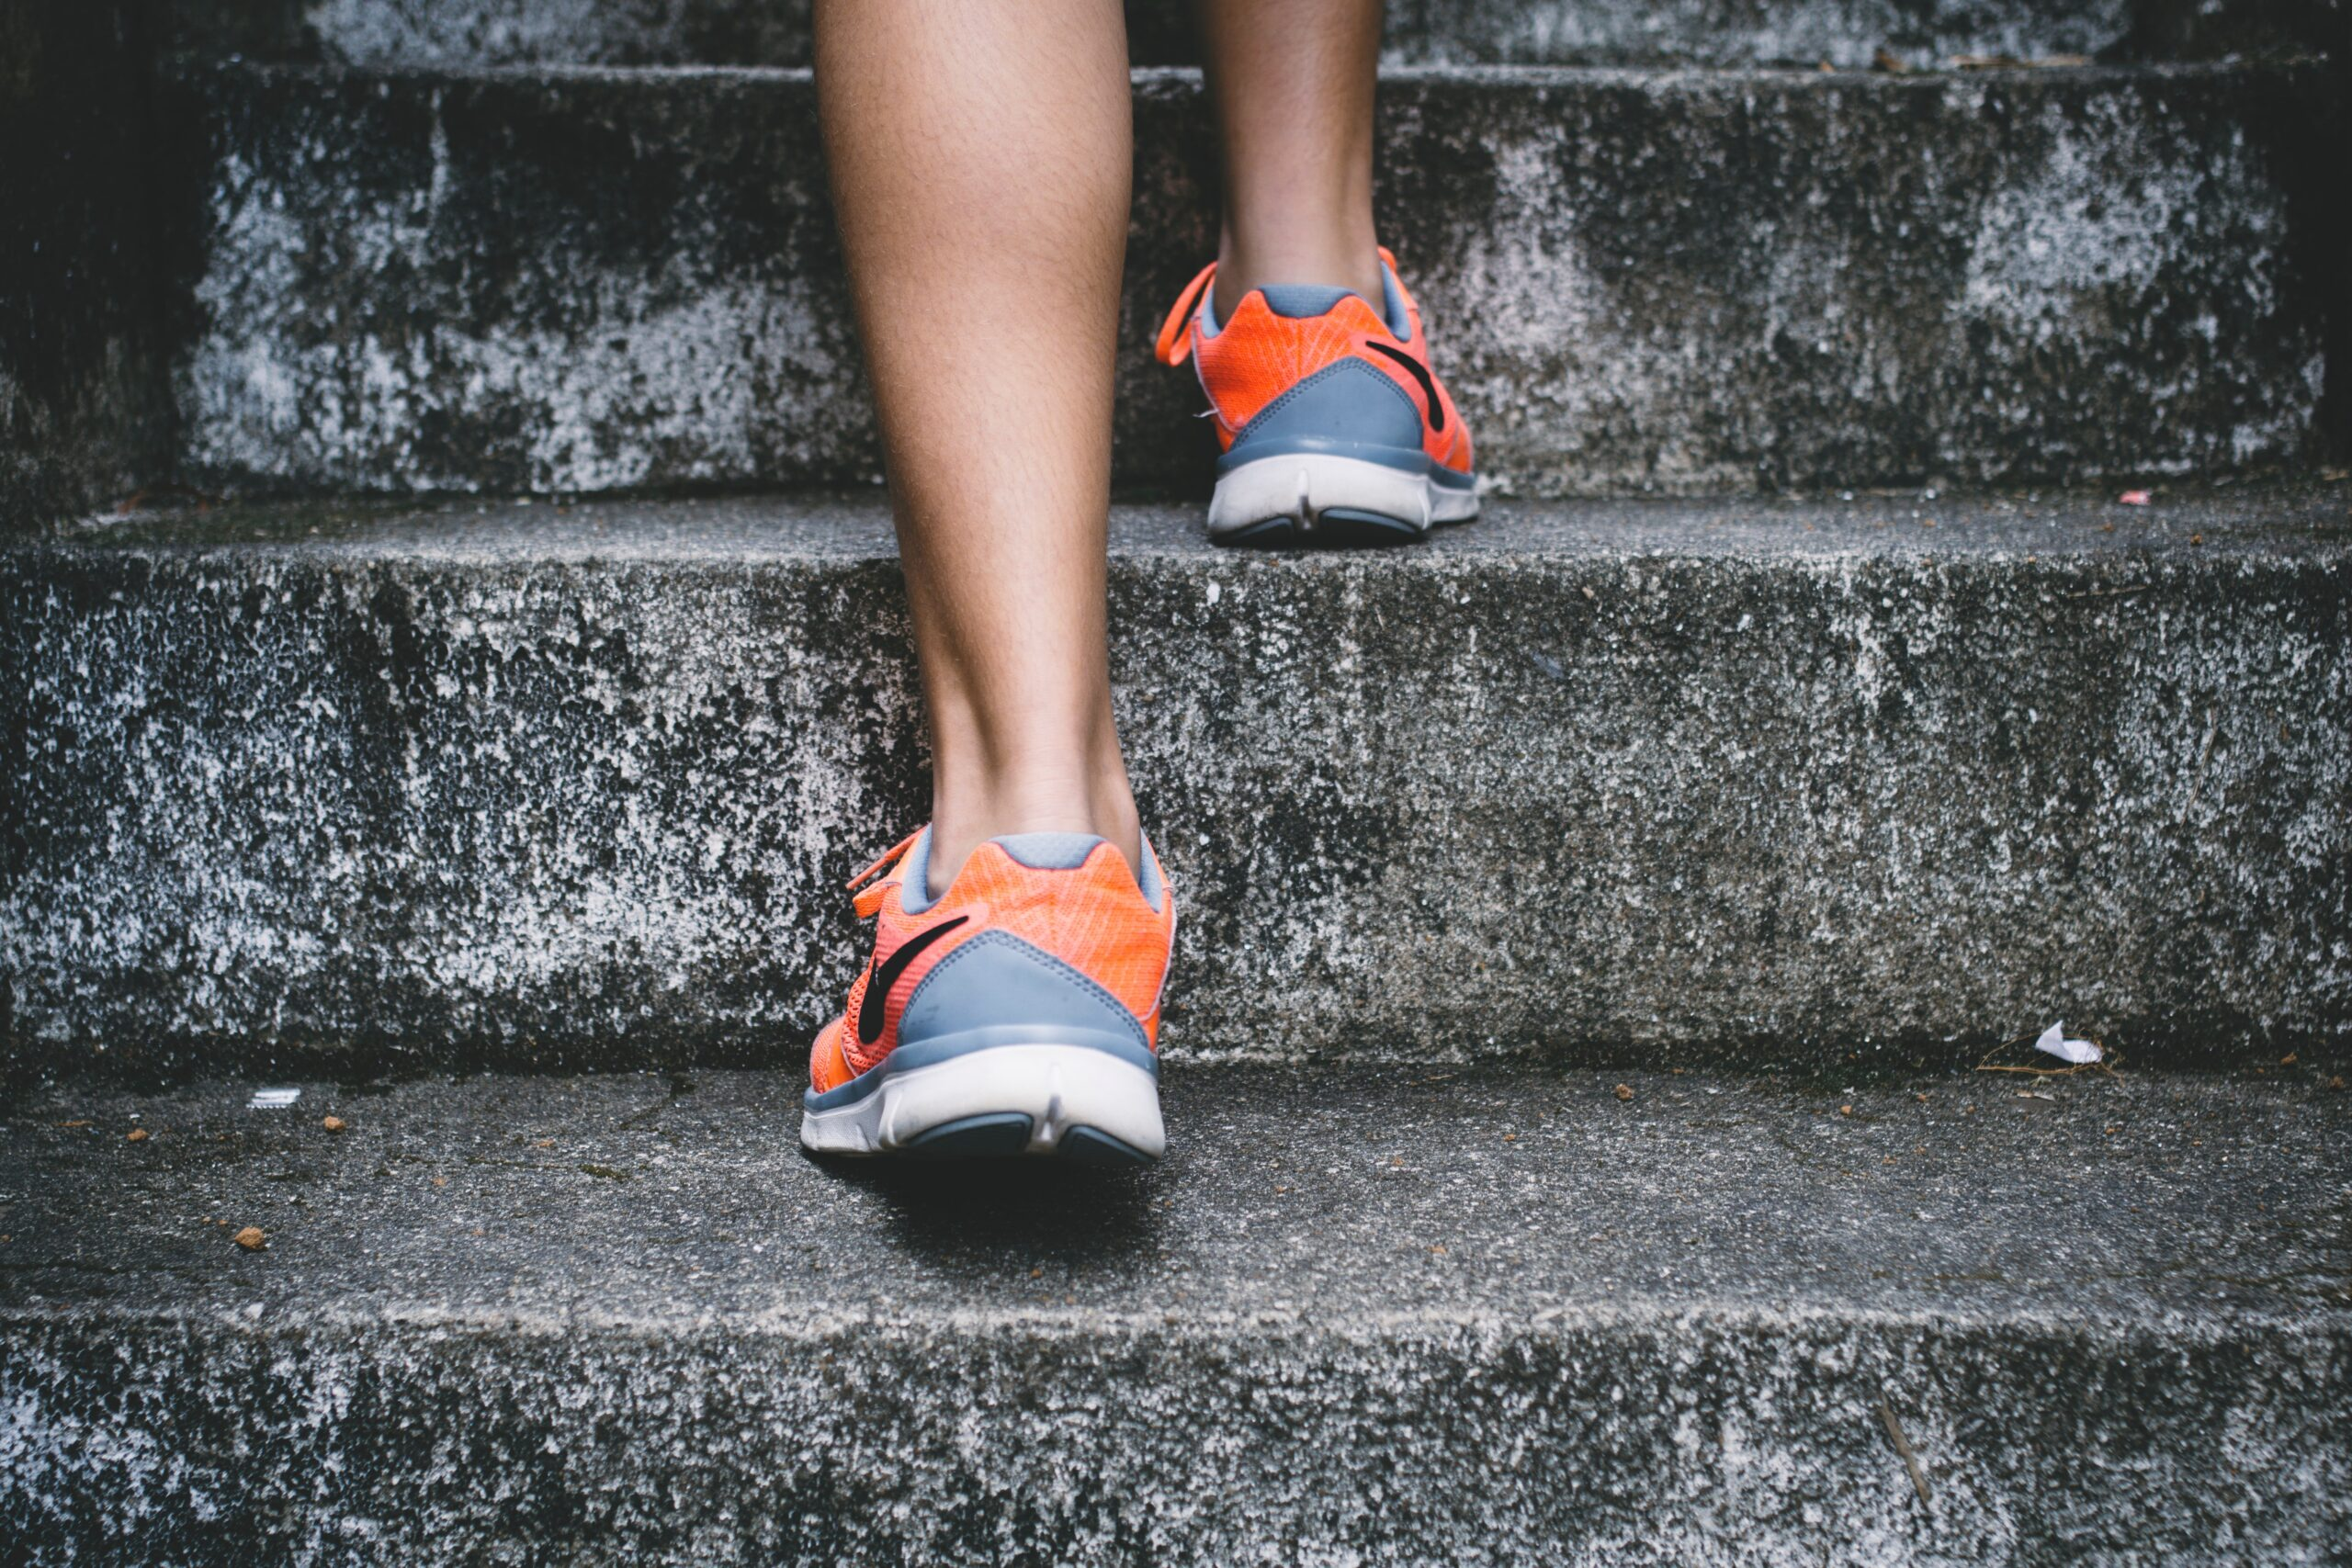 Endurance Athlete